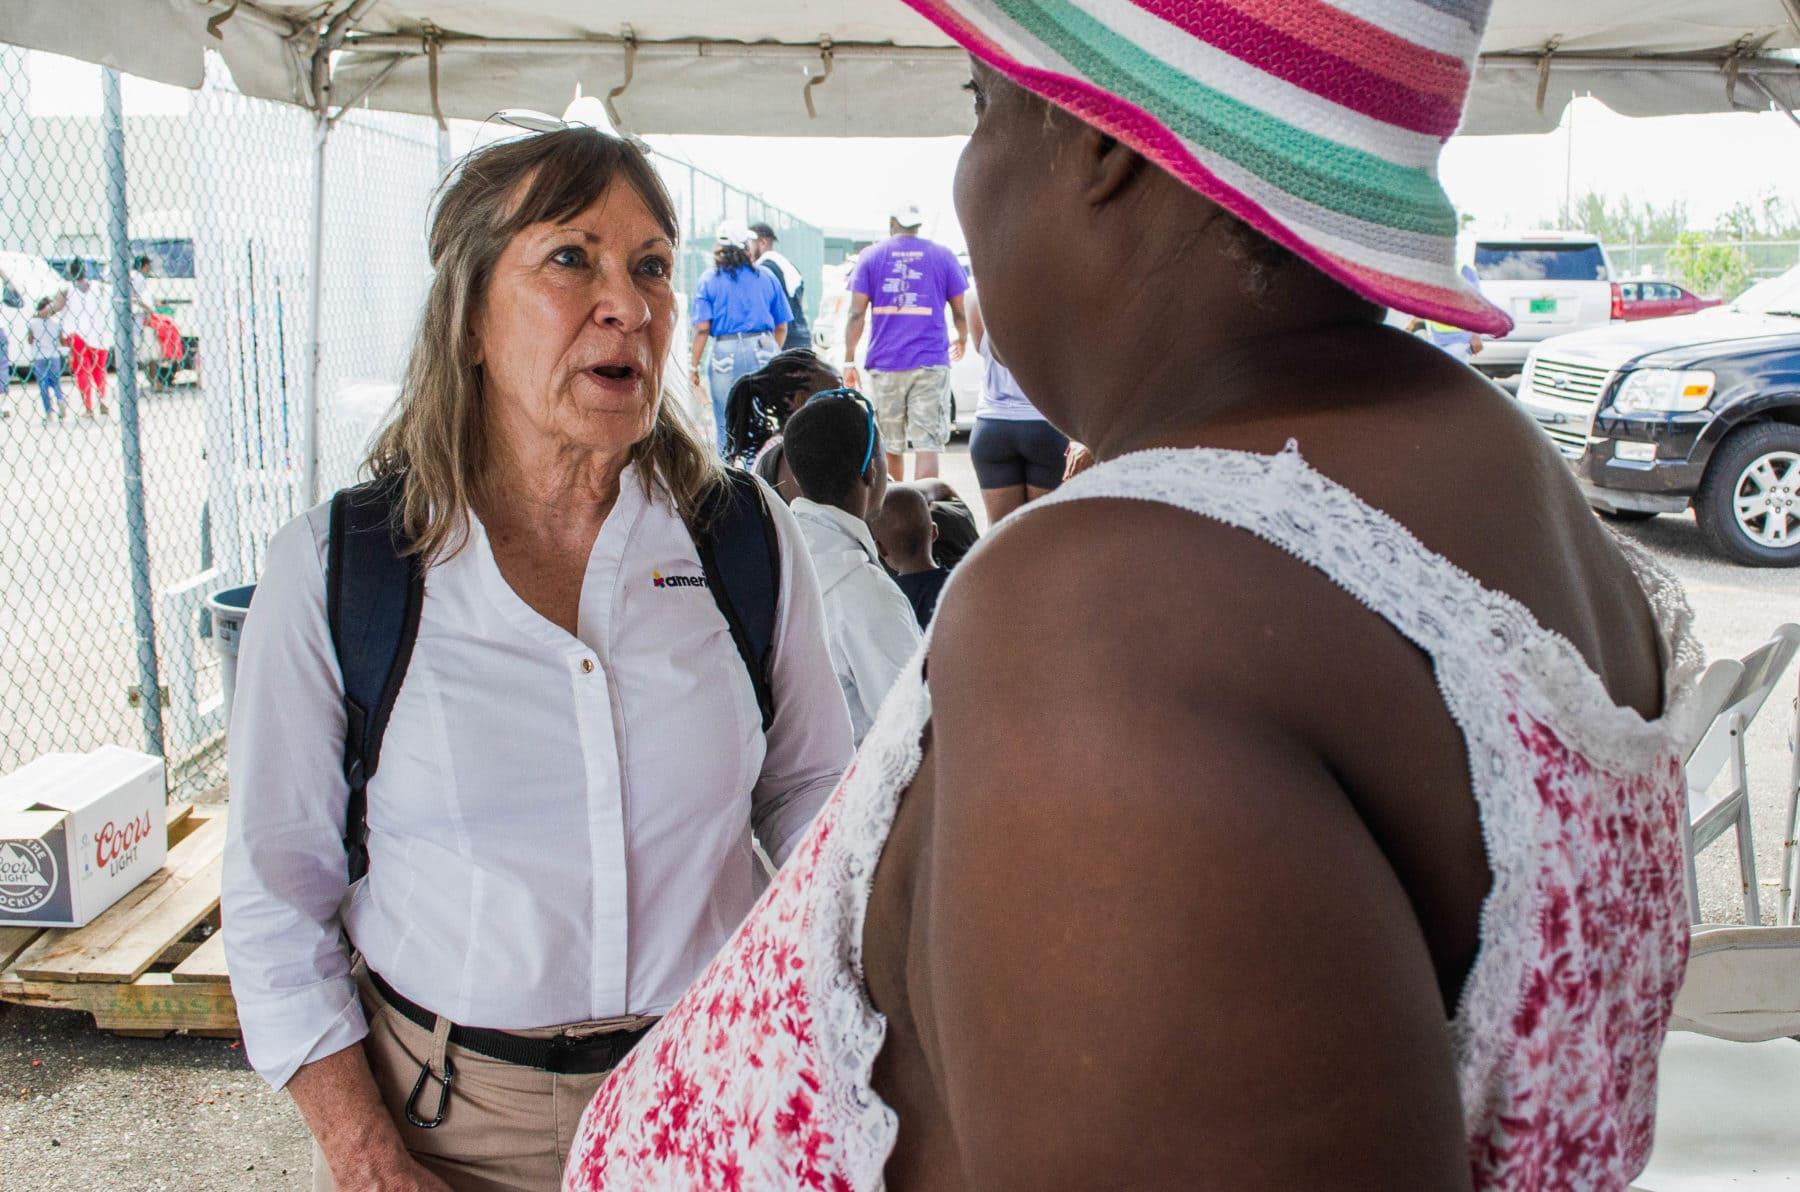 Americares emergency responder Lisa LaDue talks with Hurricane Dorian survivor Juliette